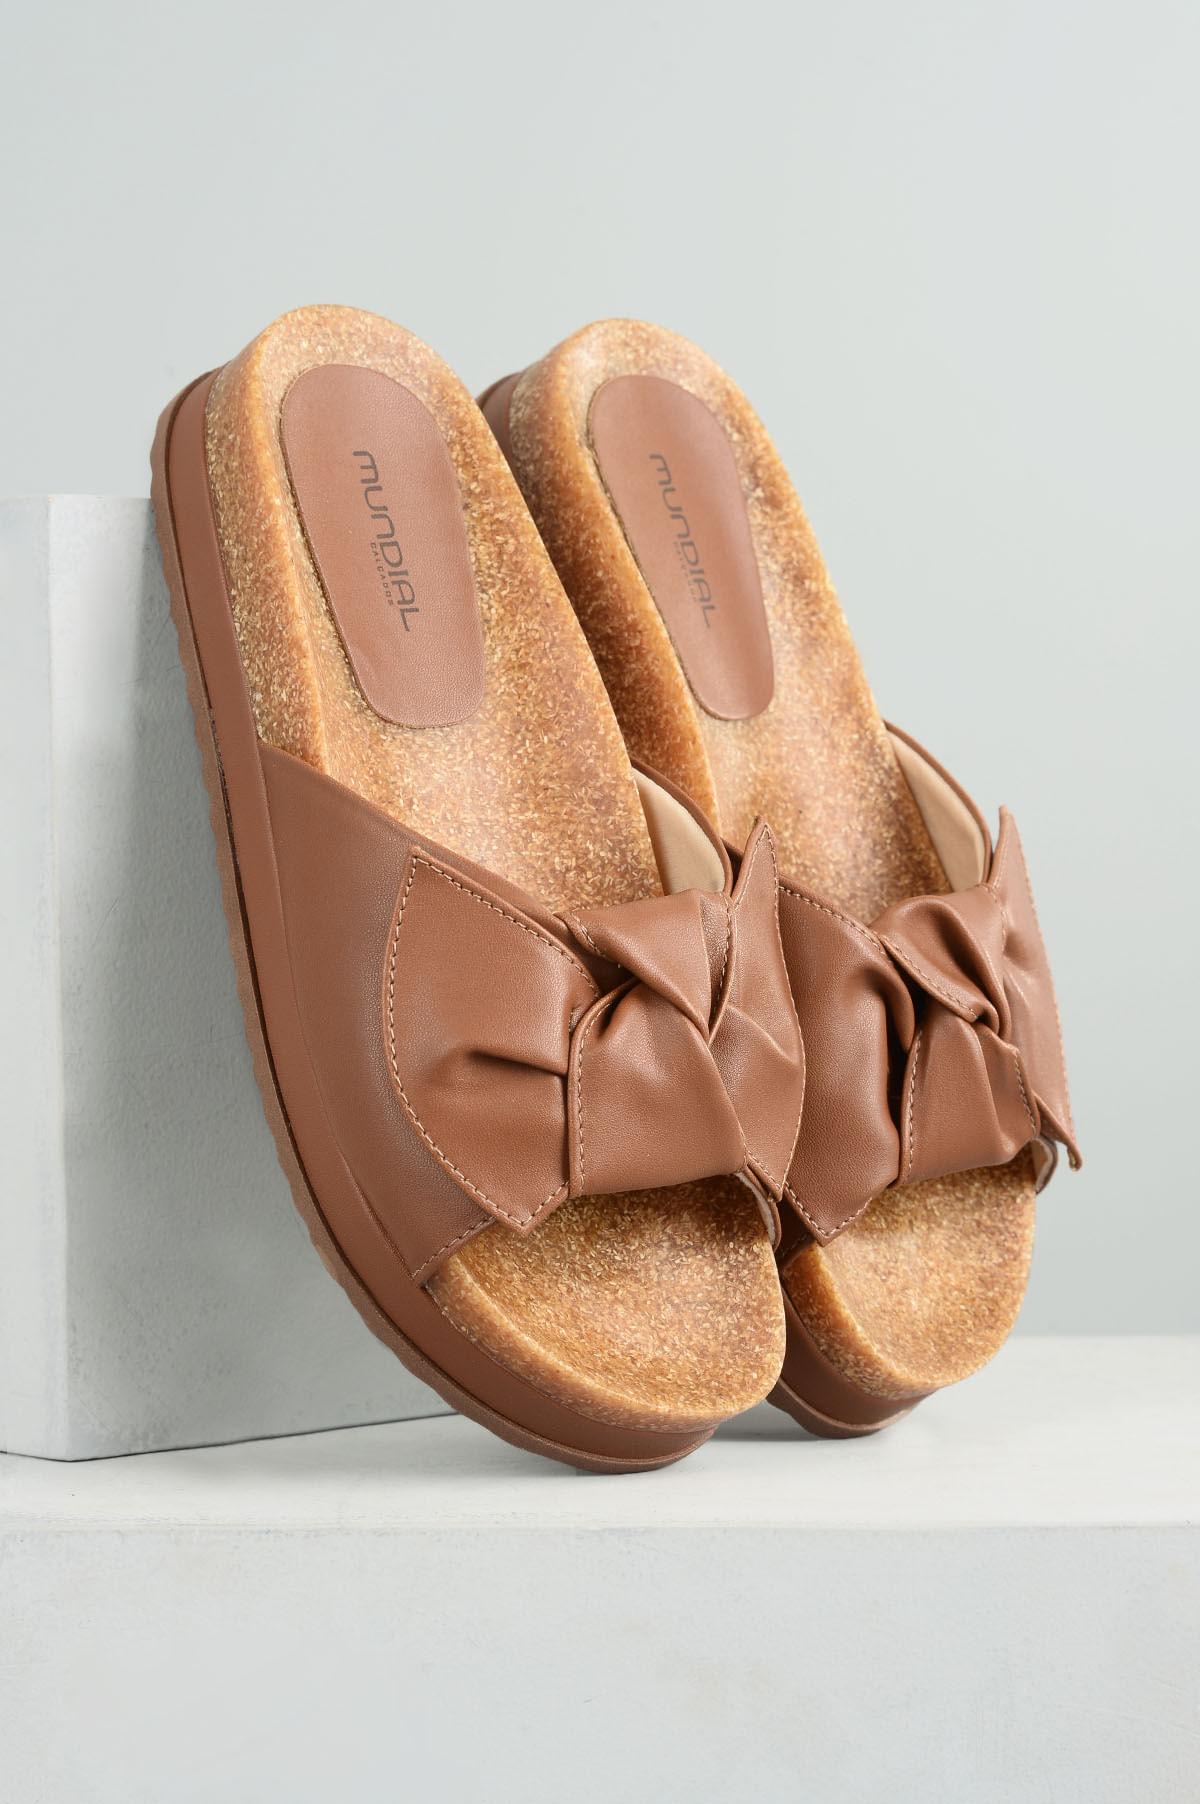 525ad92869 Chinelo Feminino Marly Mundial SINT - CARAMELO - Mundial Calçados